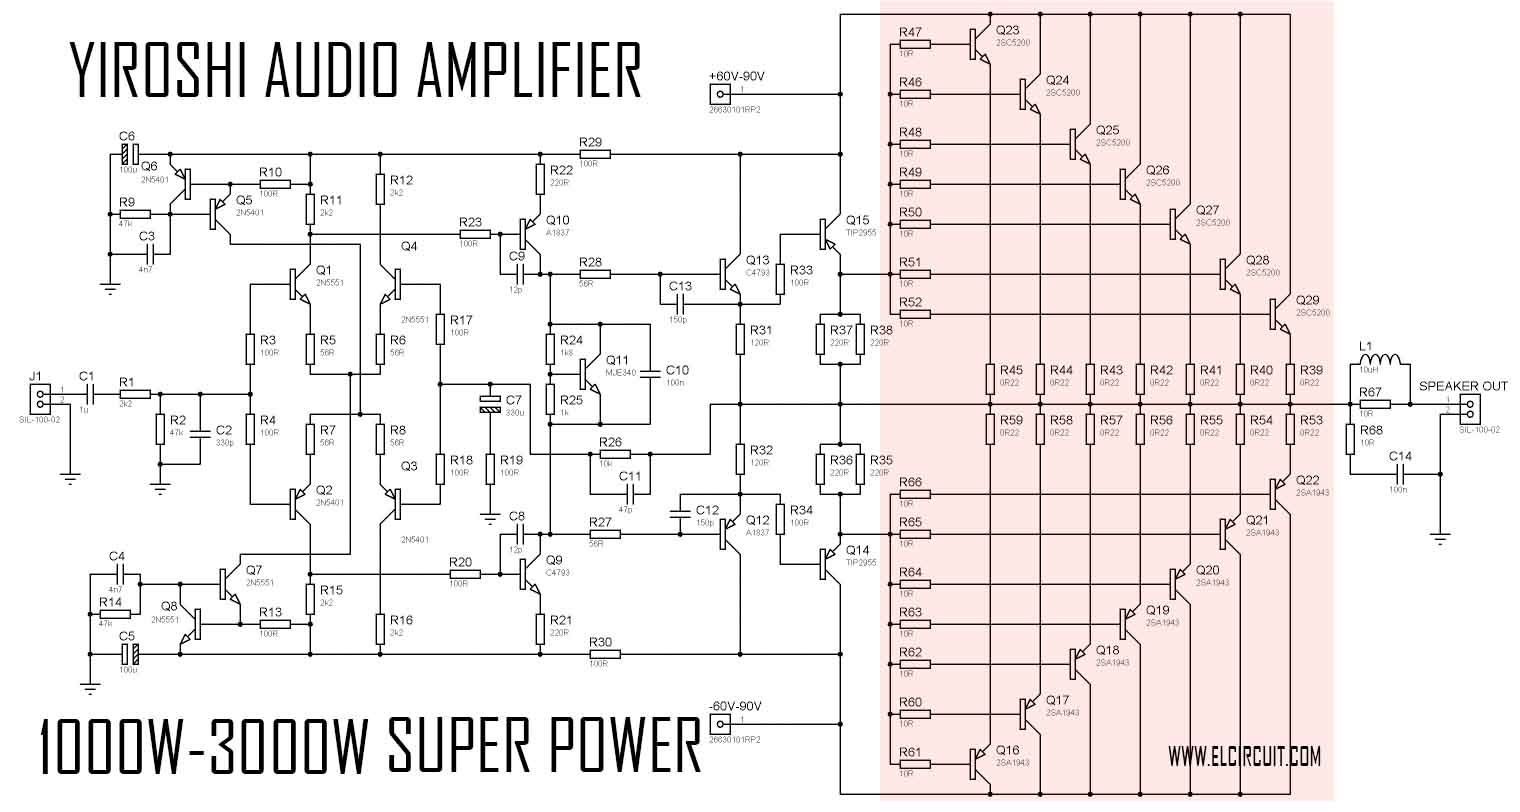 100w subwoofer amplifier circuit diagram white rodgers wiring super power yiroshi audio 1000 watt ampli